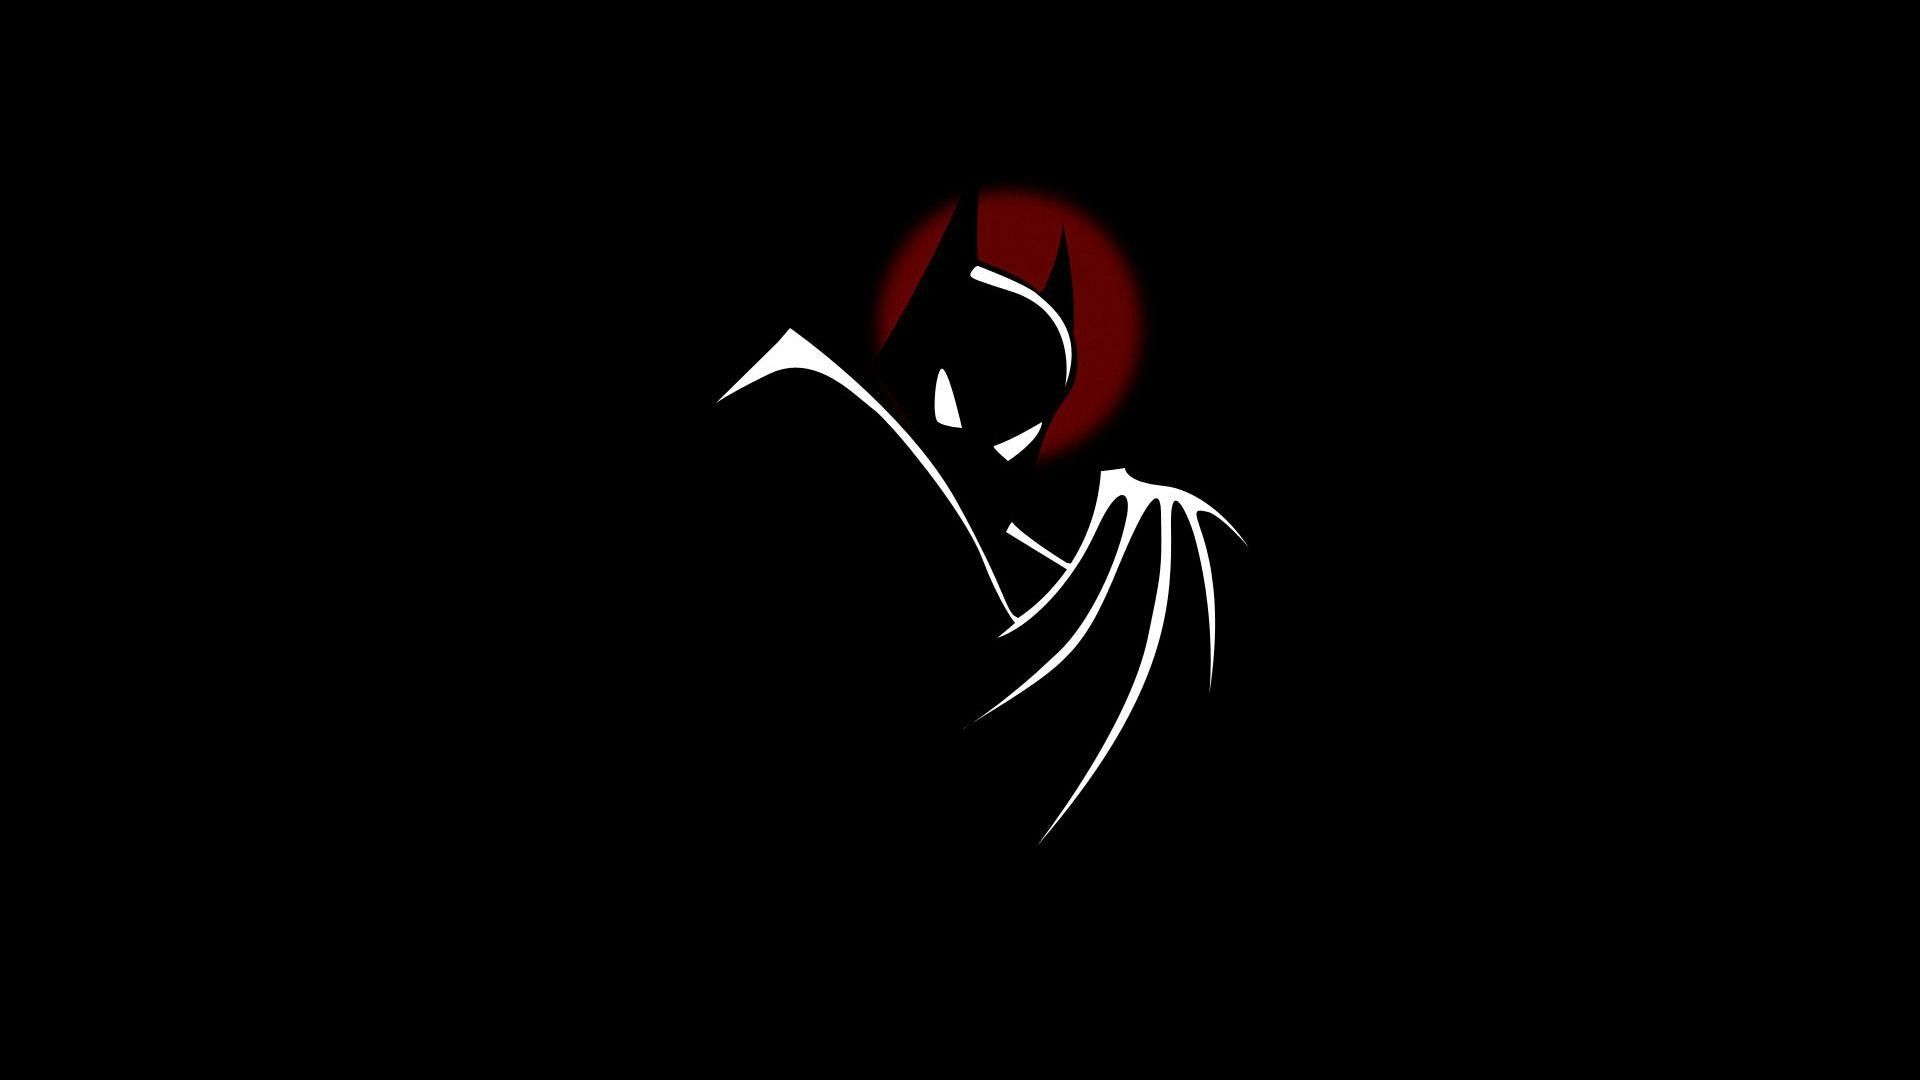 Black Batman Wallpapers Group (82+)